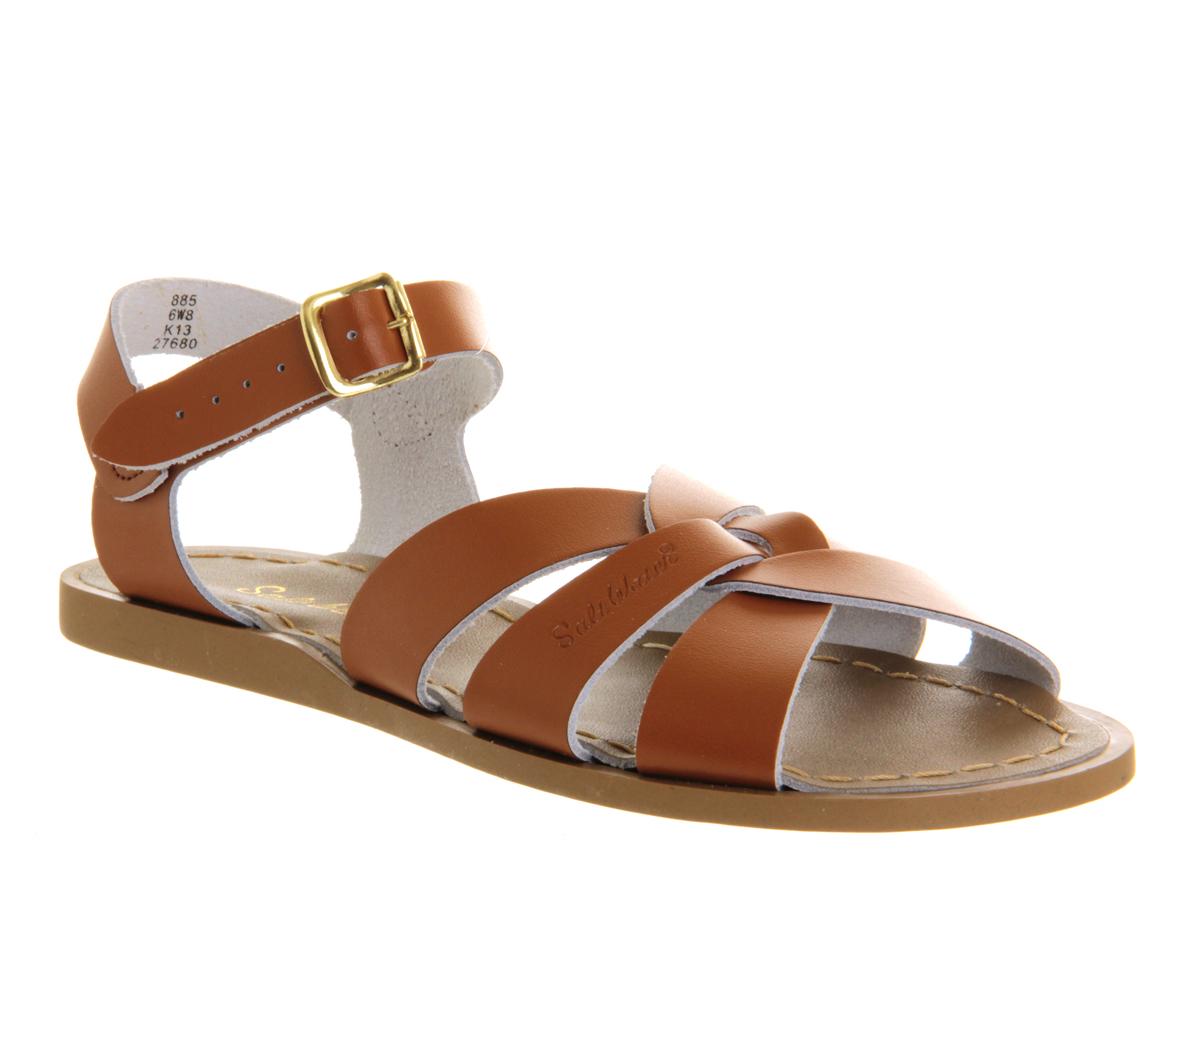 4139e6ed79dc Sentinel Womens Salt Water Original Sandals TAN LEATHER Sandals